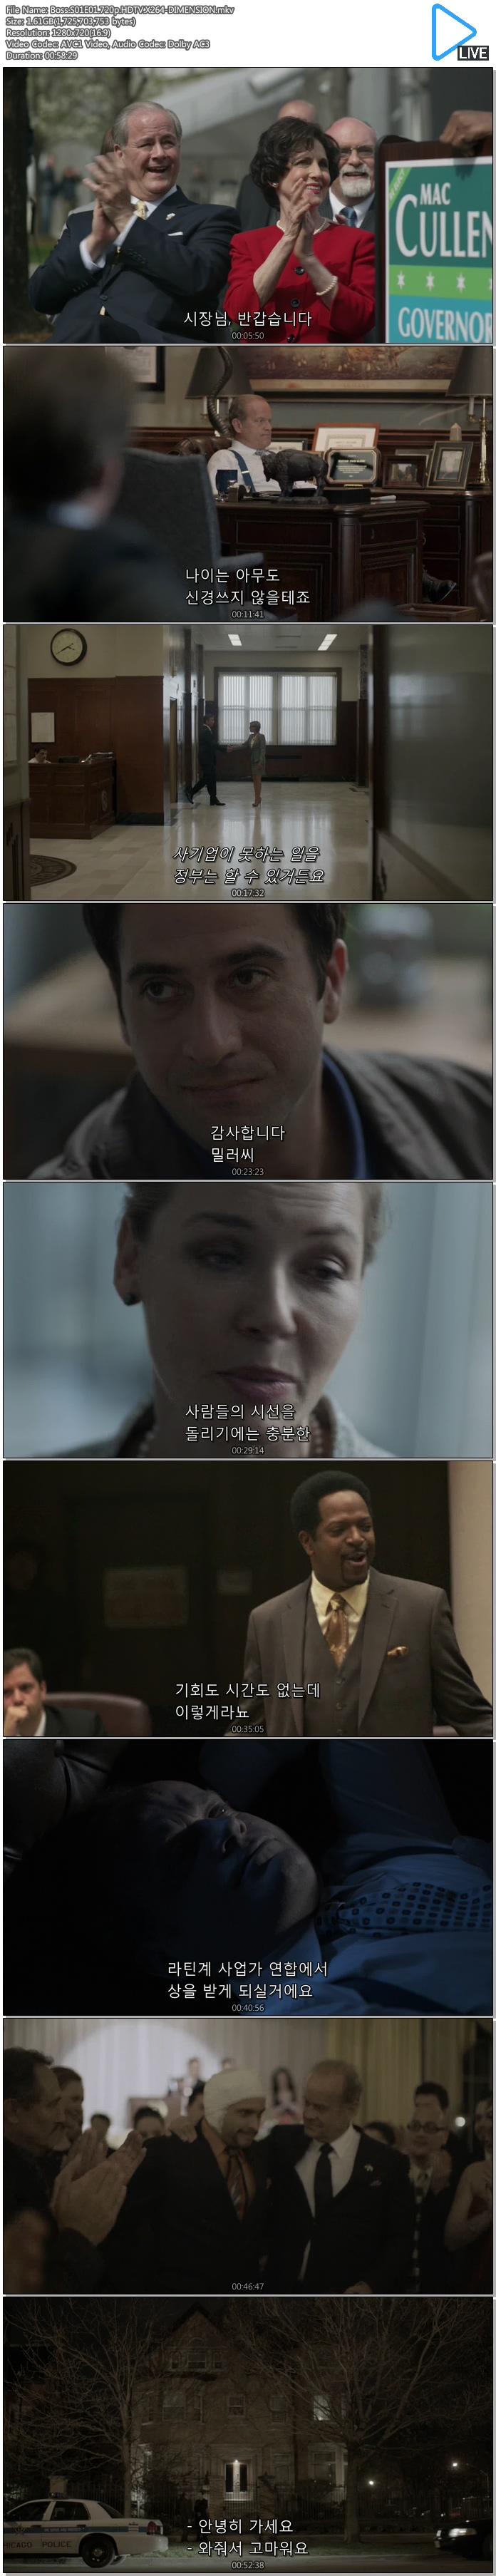 The.Flash.2014.S01E01.HDTV.x264-LOL & The.Flash.2014 ...